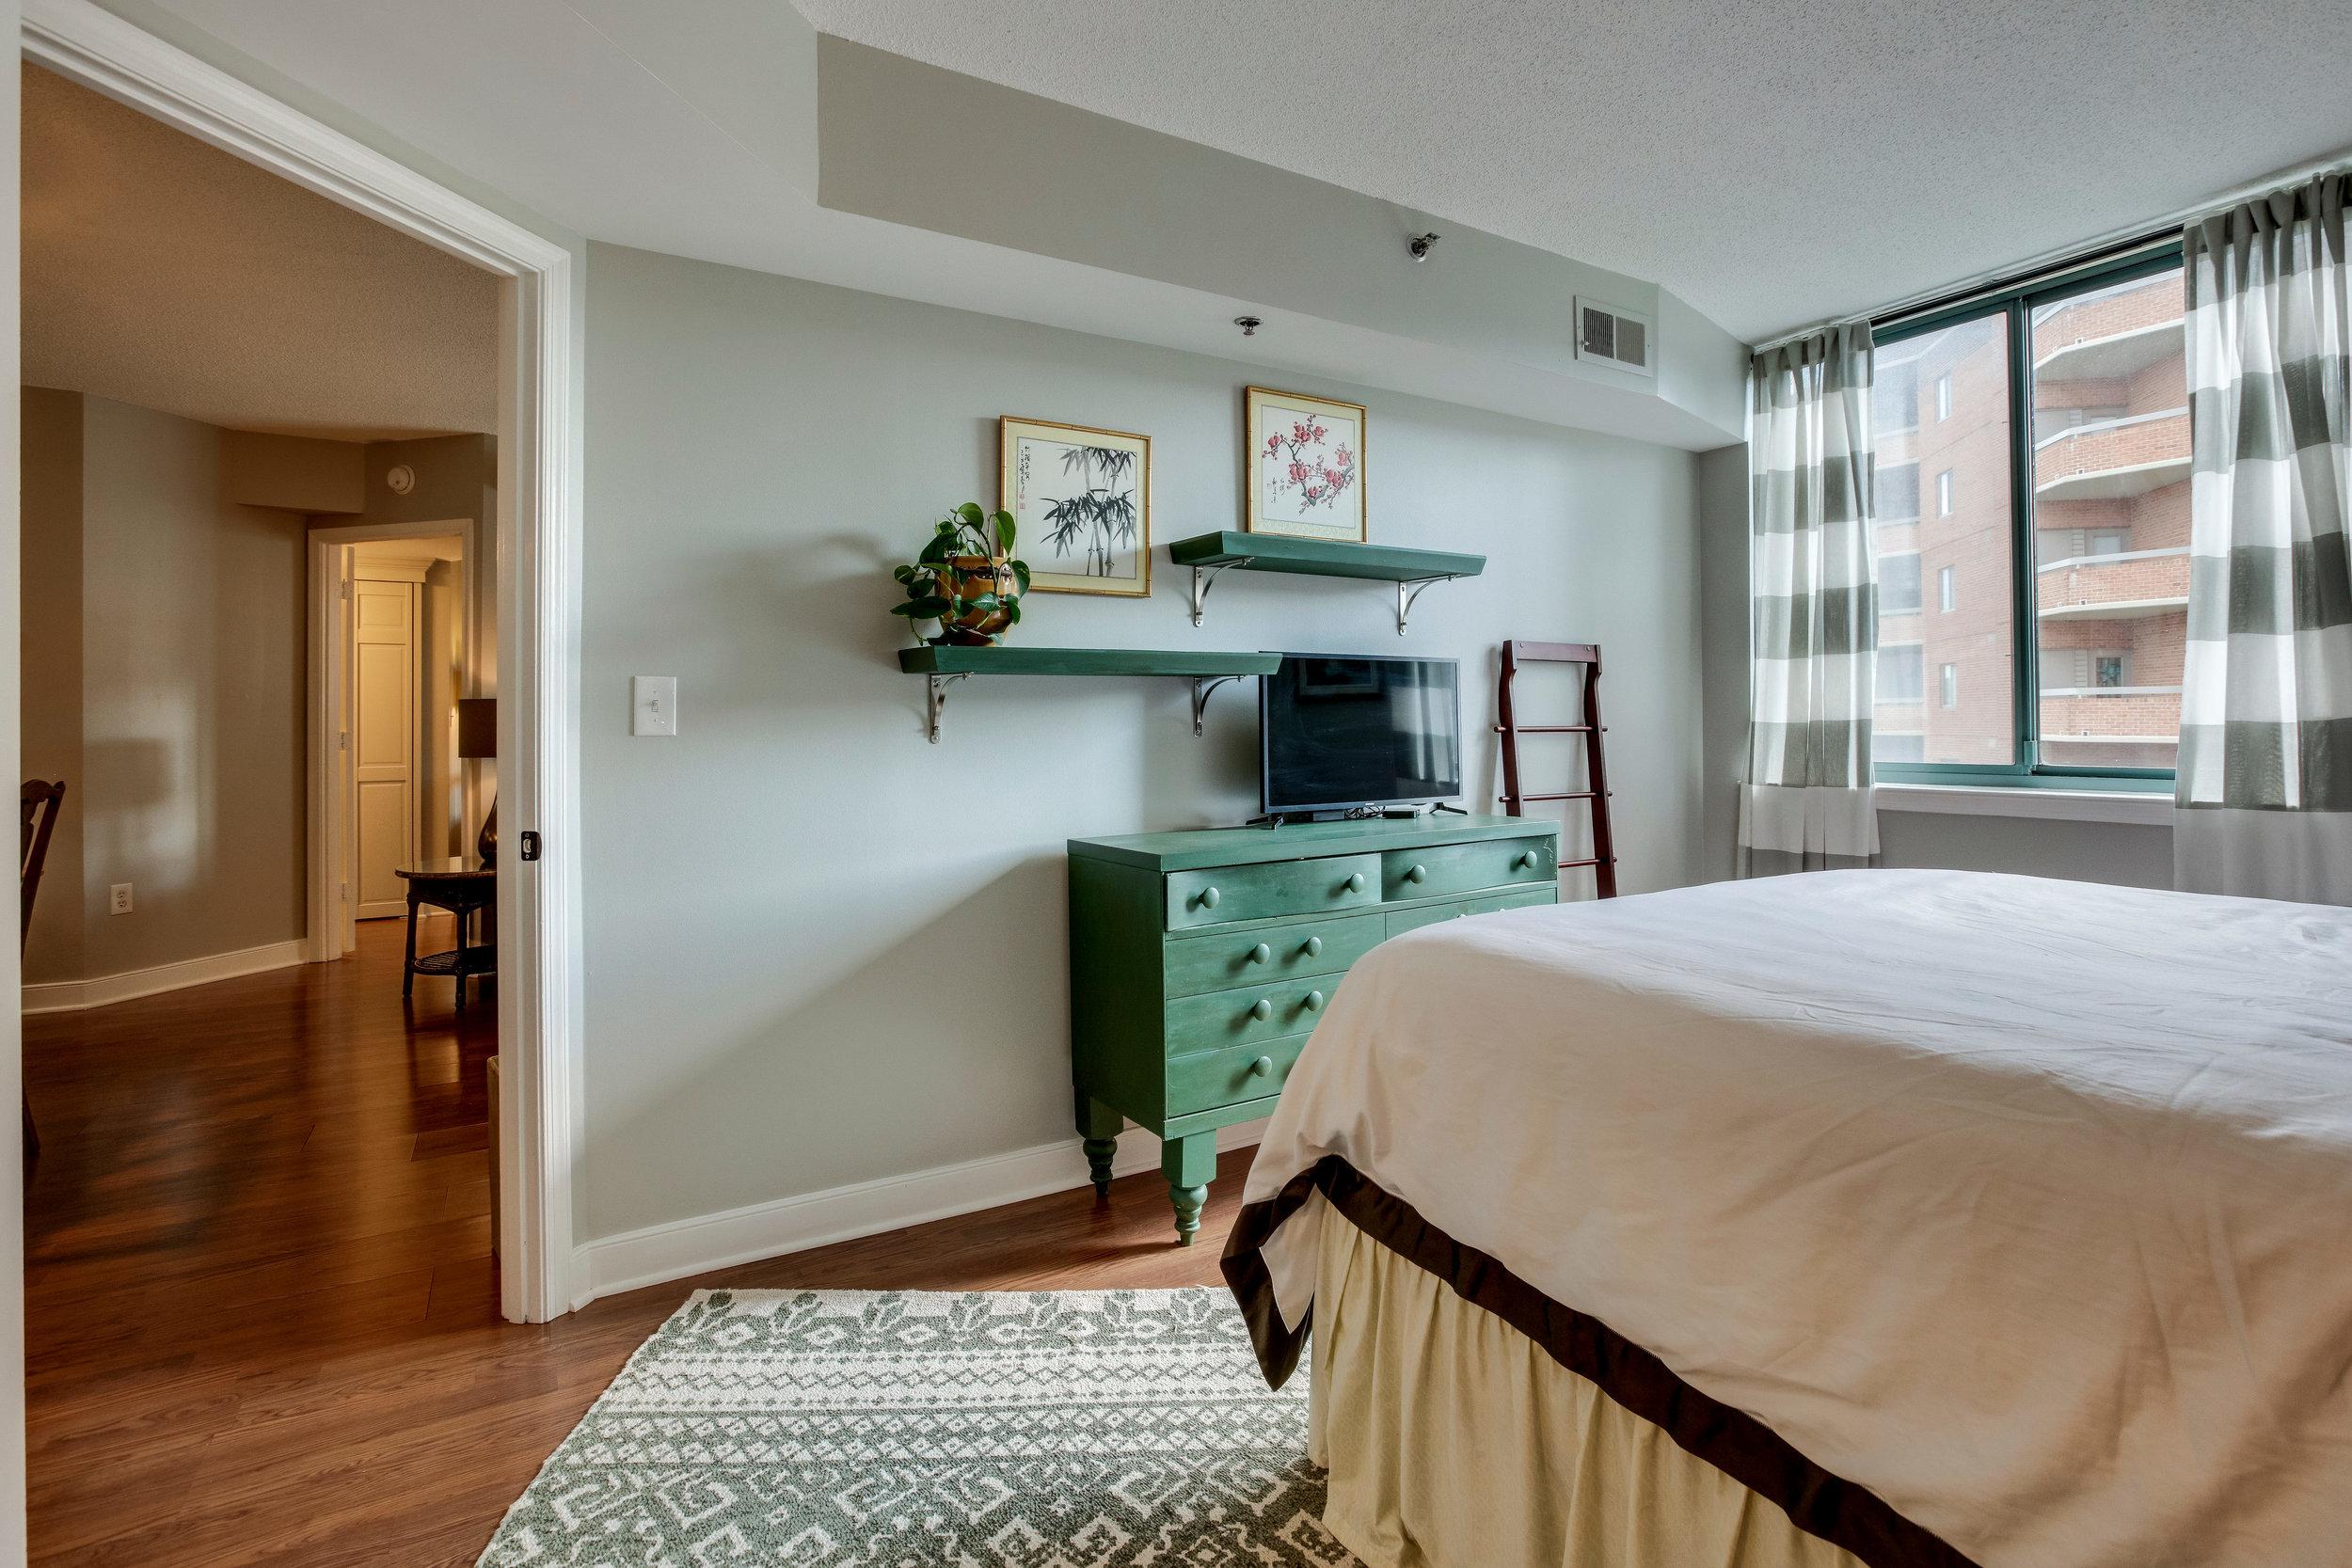 1050 N Taylor St 608 Arlington-print-046-28-Bedroom-4200x2800-300dpi.jpg